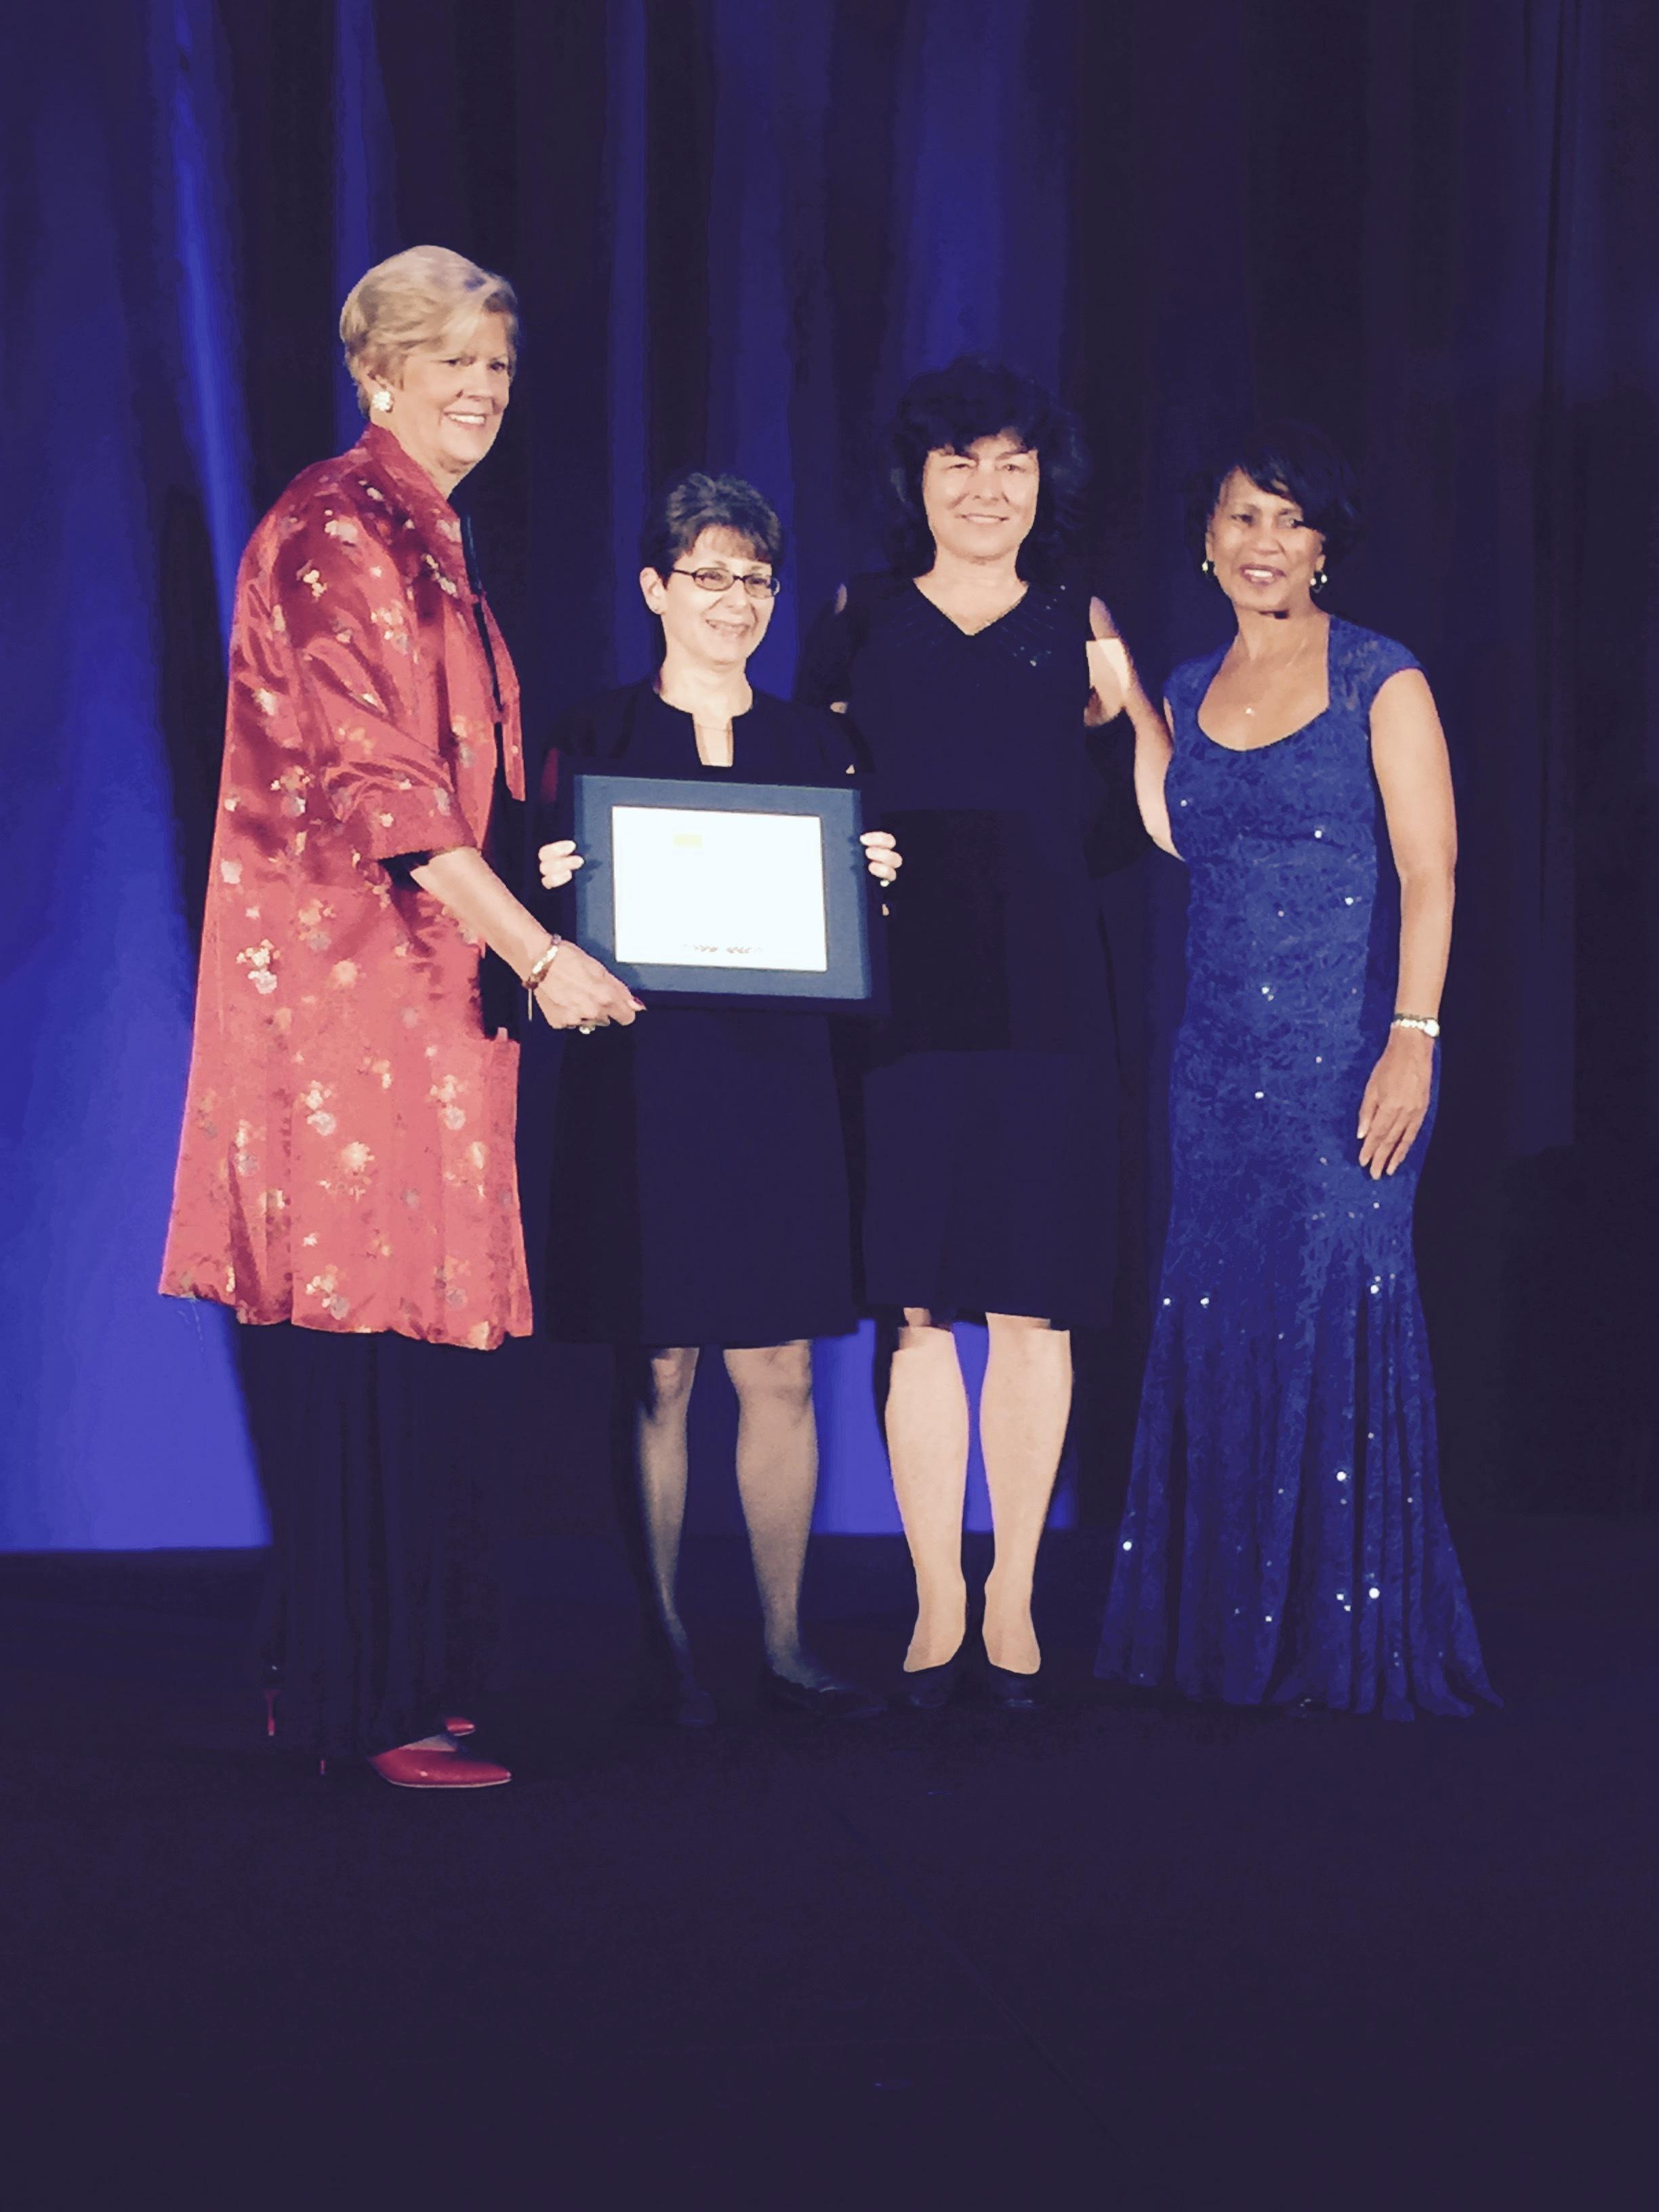 c2c6925fb10579a6187d_CoE_Award_2015_NLN_Summit__4_.jpg